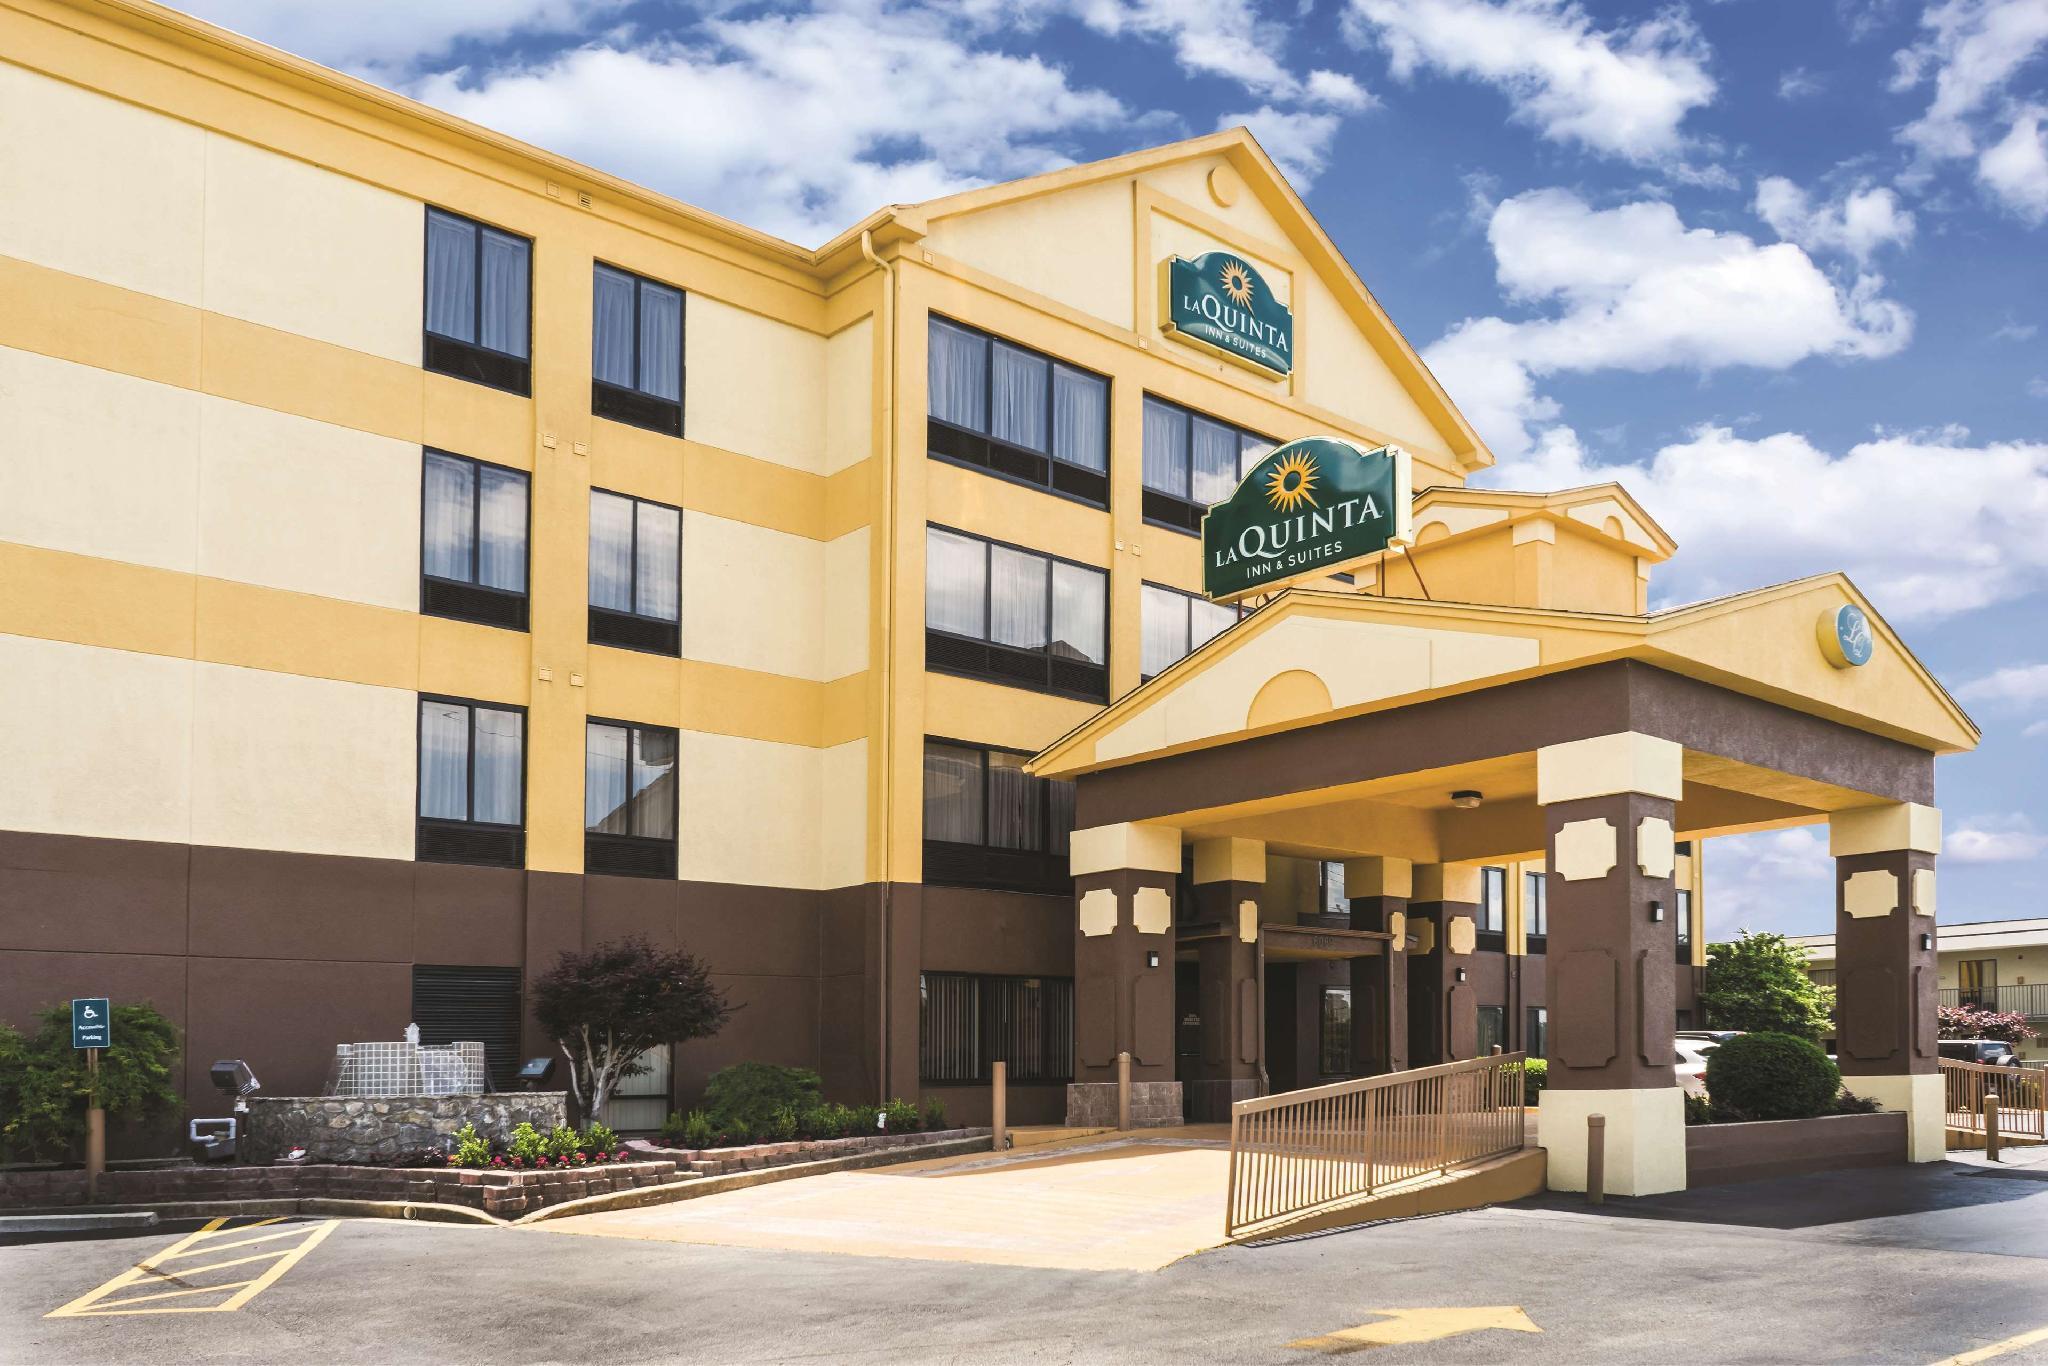 La Quinta Inn And Suites Memphis East Sycamore View